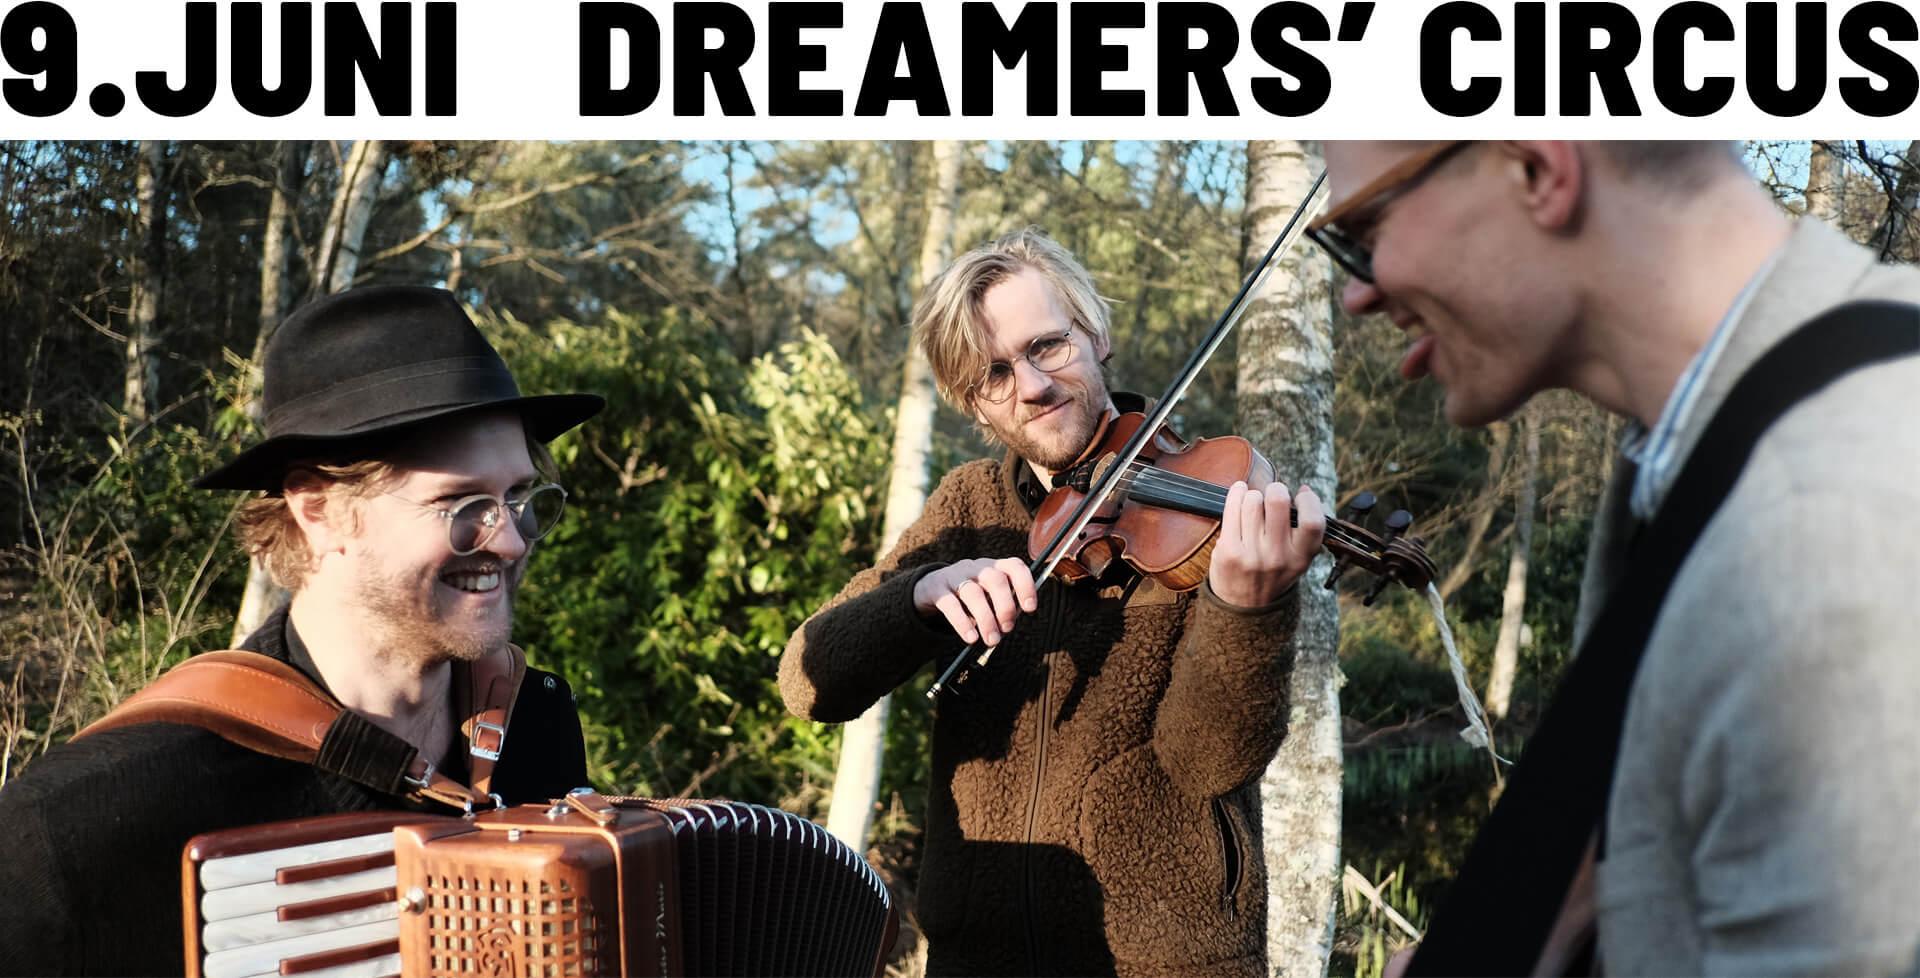 Dreamers Cirkus - Cinema Concert - 9. juni